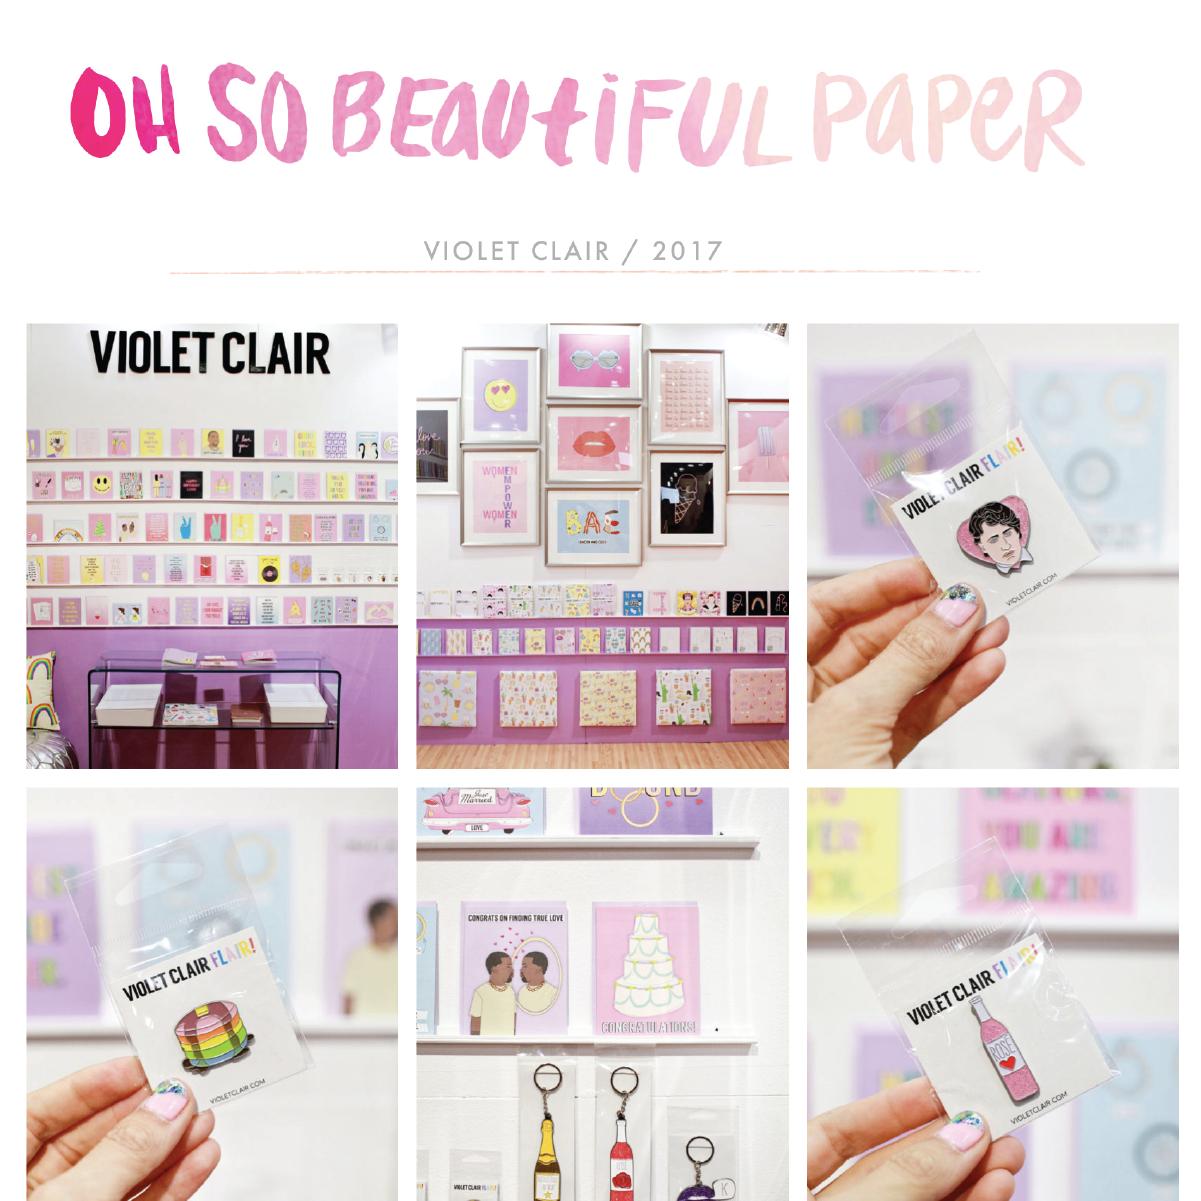 Oh So Beautiful Paper